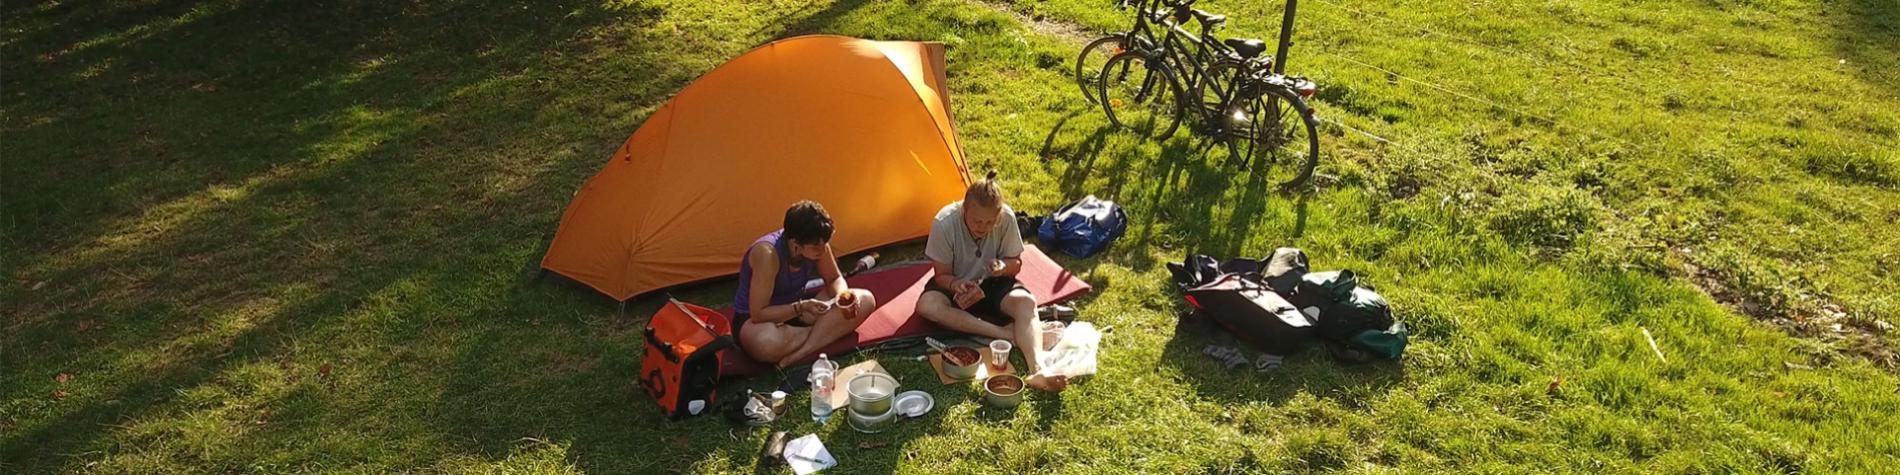 Camping - Villatoile - Anseremme - Ambiance - couple - tente